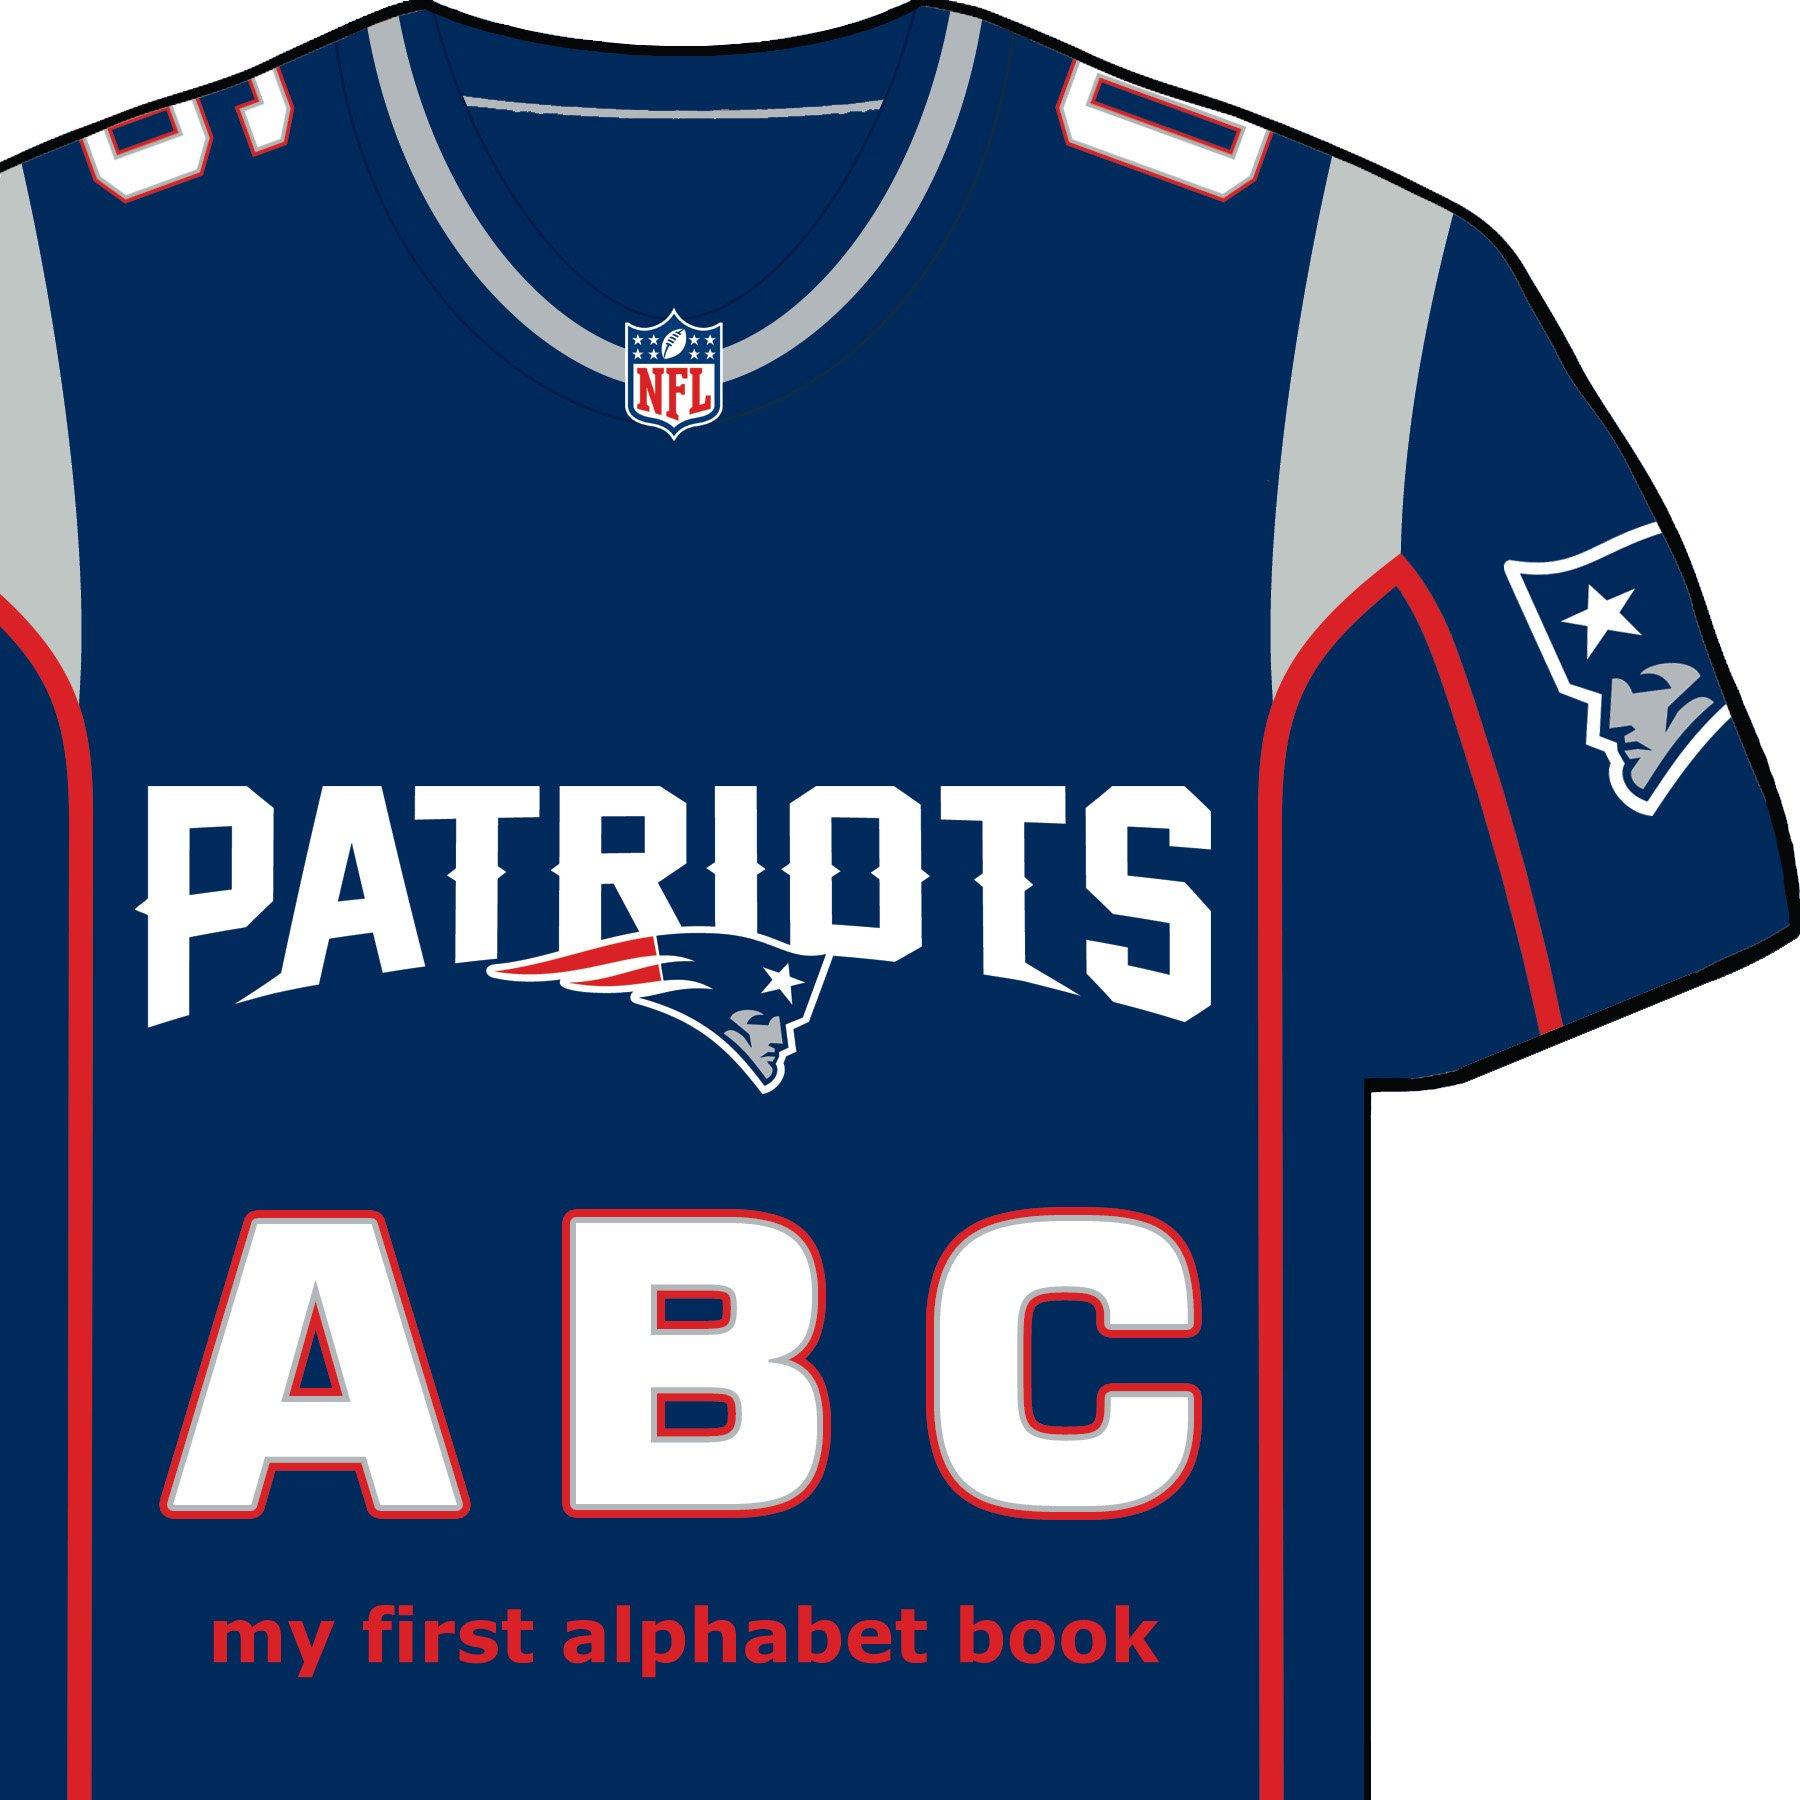 New England Patriots ABC: My First Alphabet Book (NFL ABC Board Books) (My First Alphabet Books (Michaelson Entertainment))